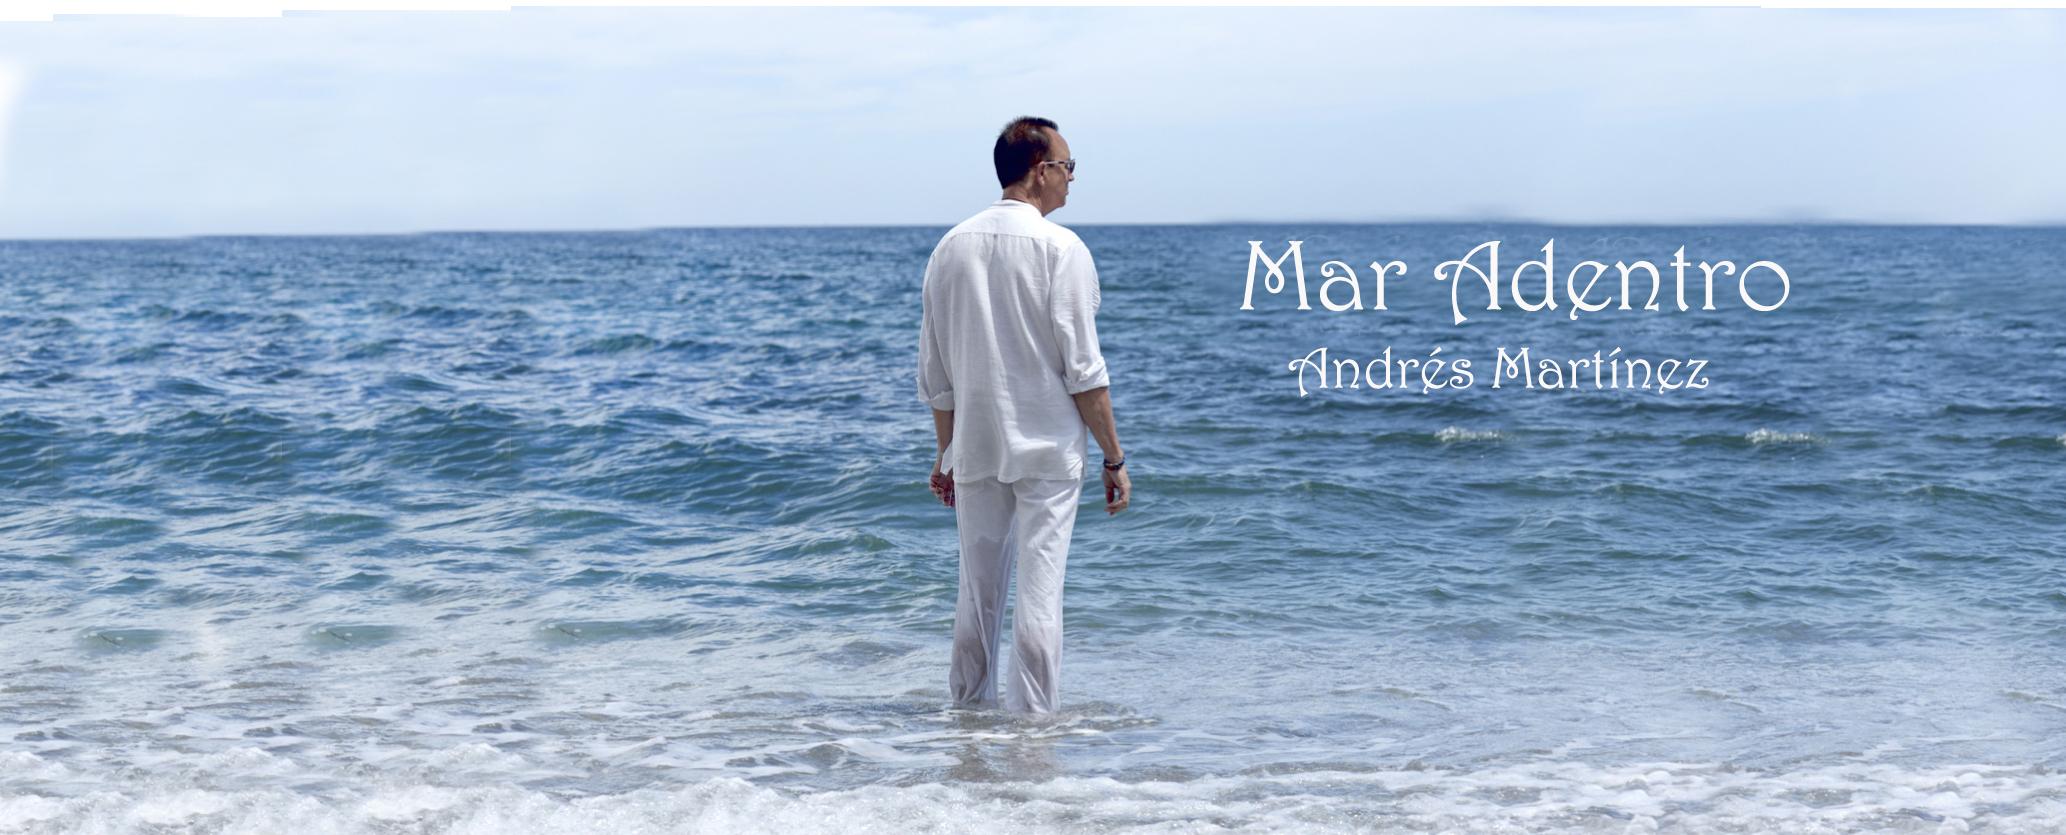 Mar adentro andrés martínez1